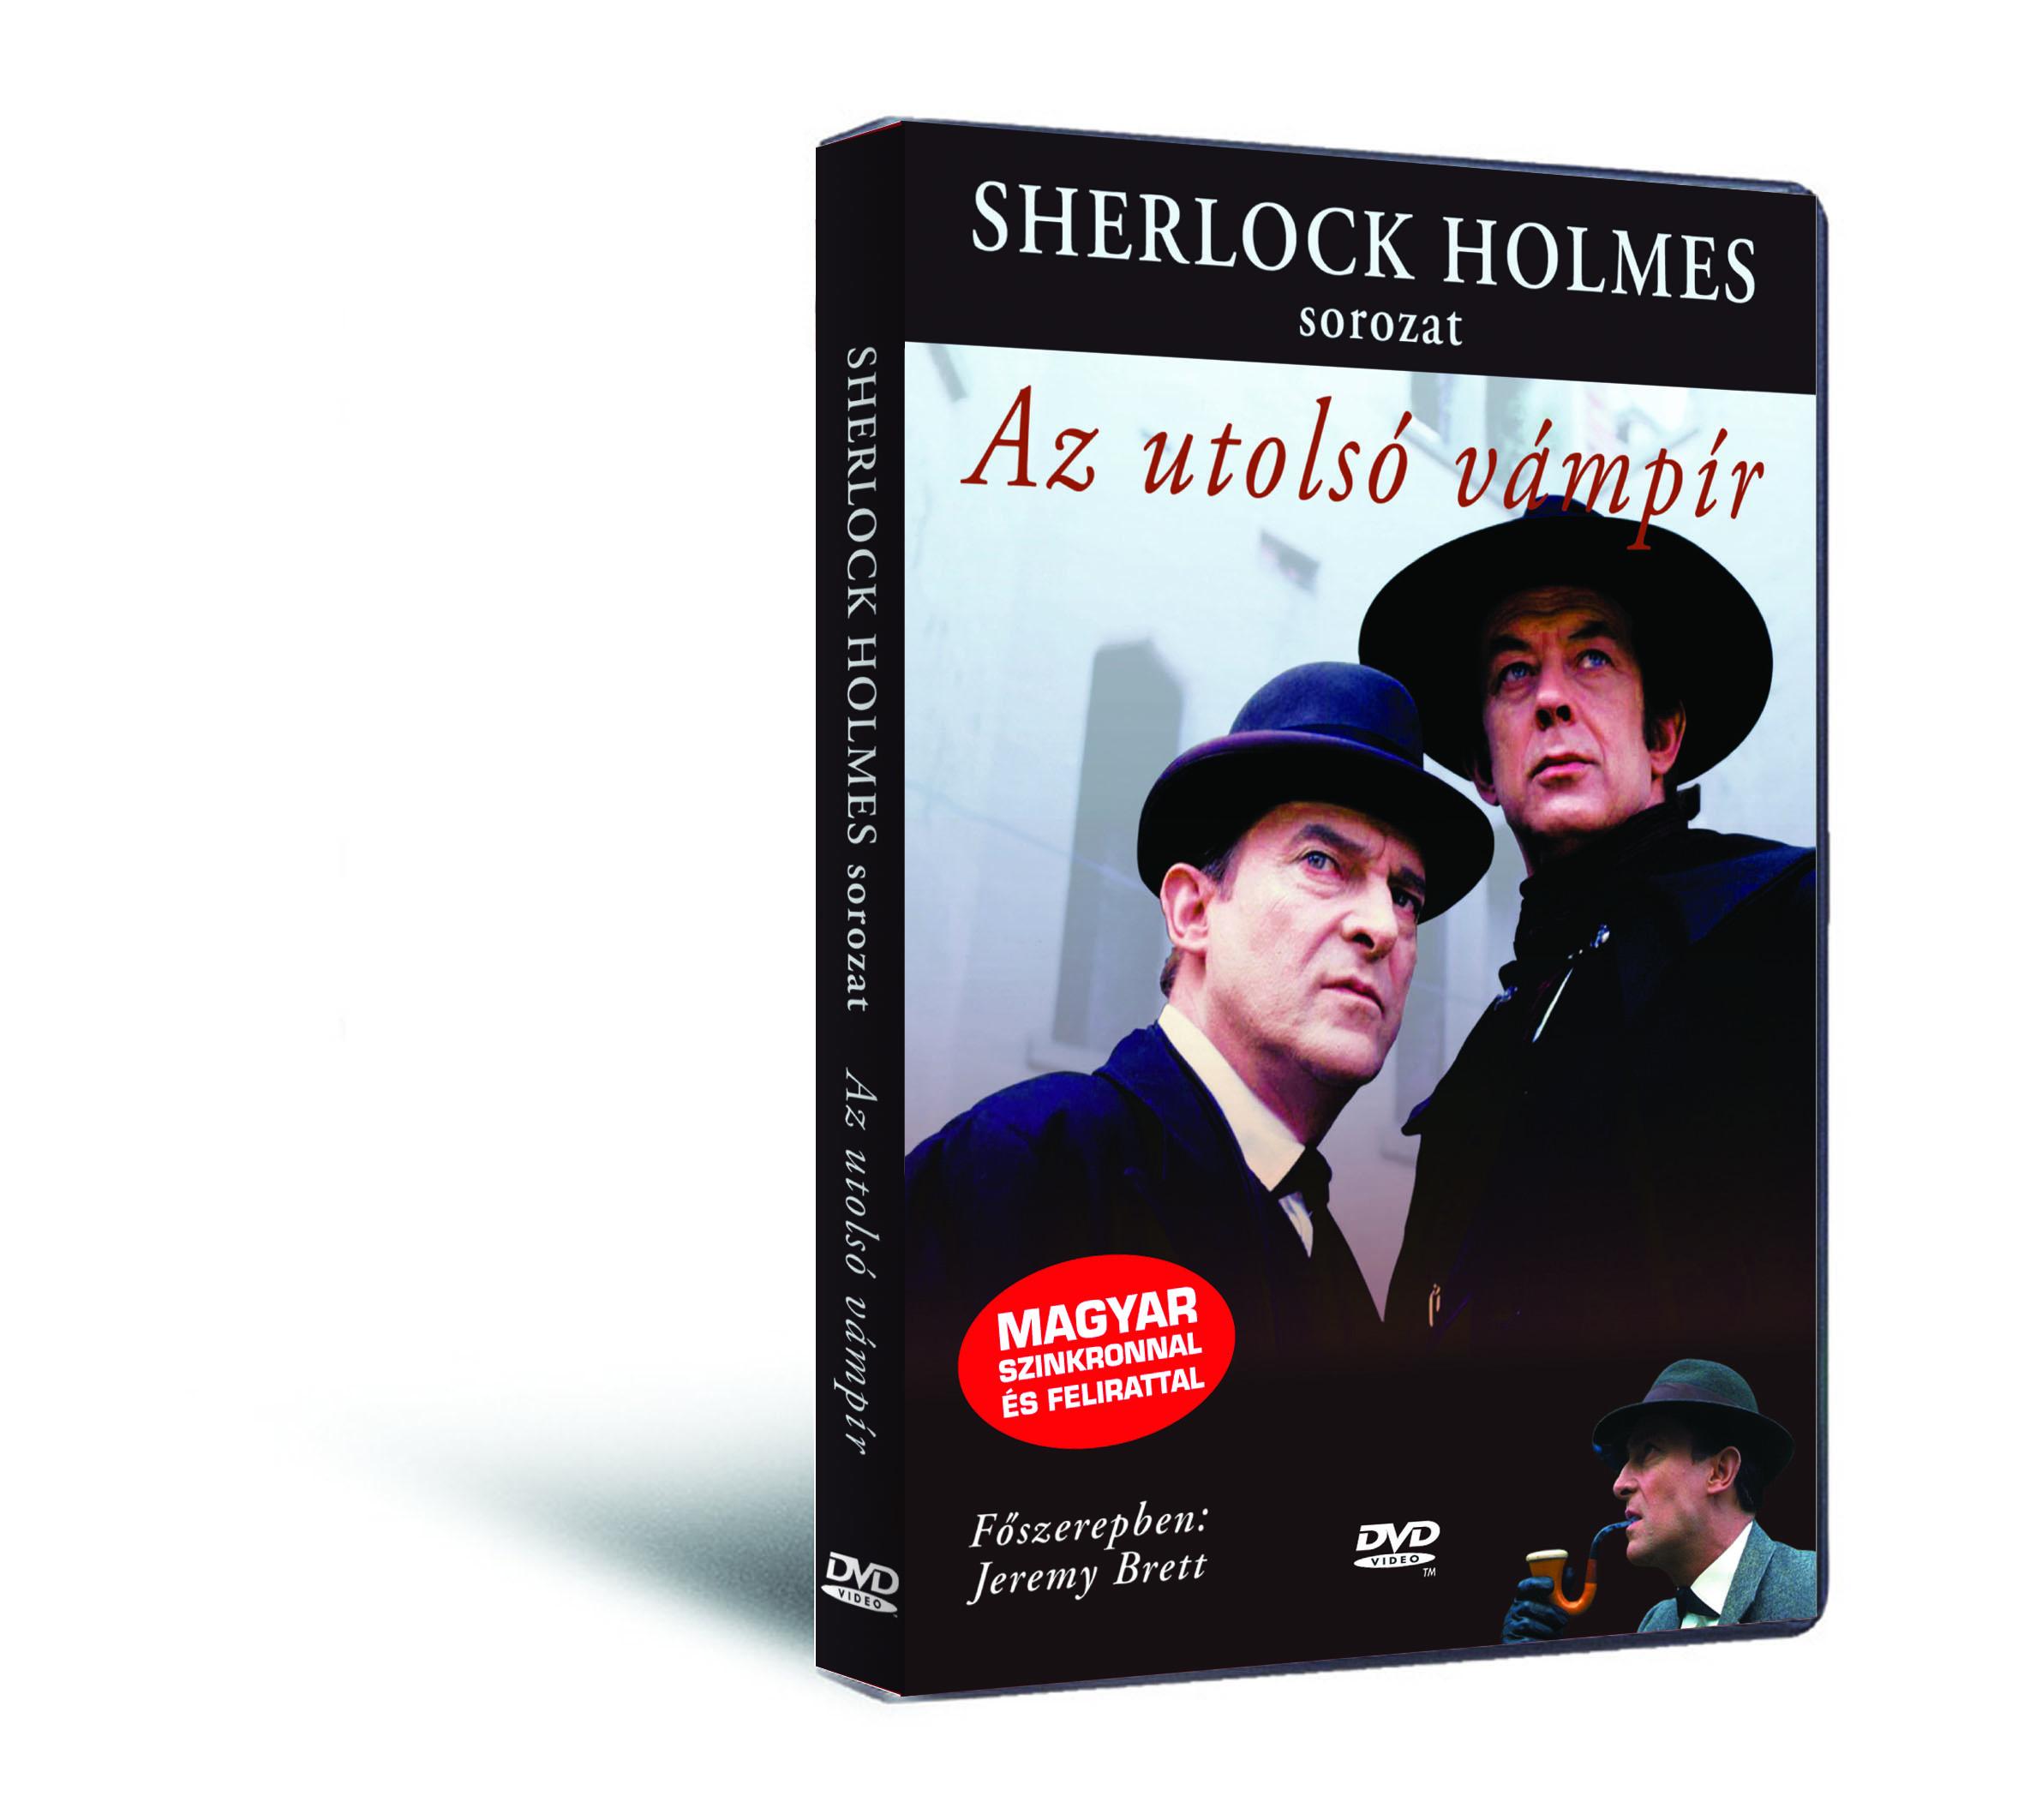 Sherlock Holmes - Utolsó vámpír - DVD